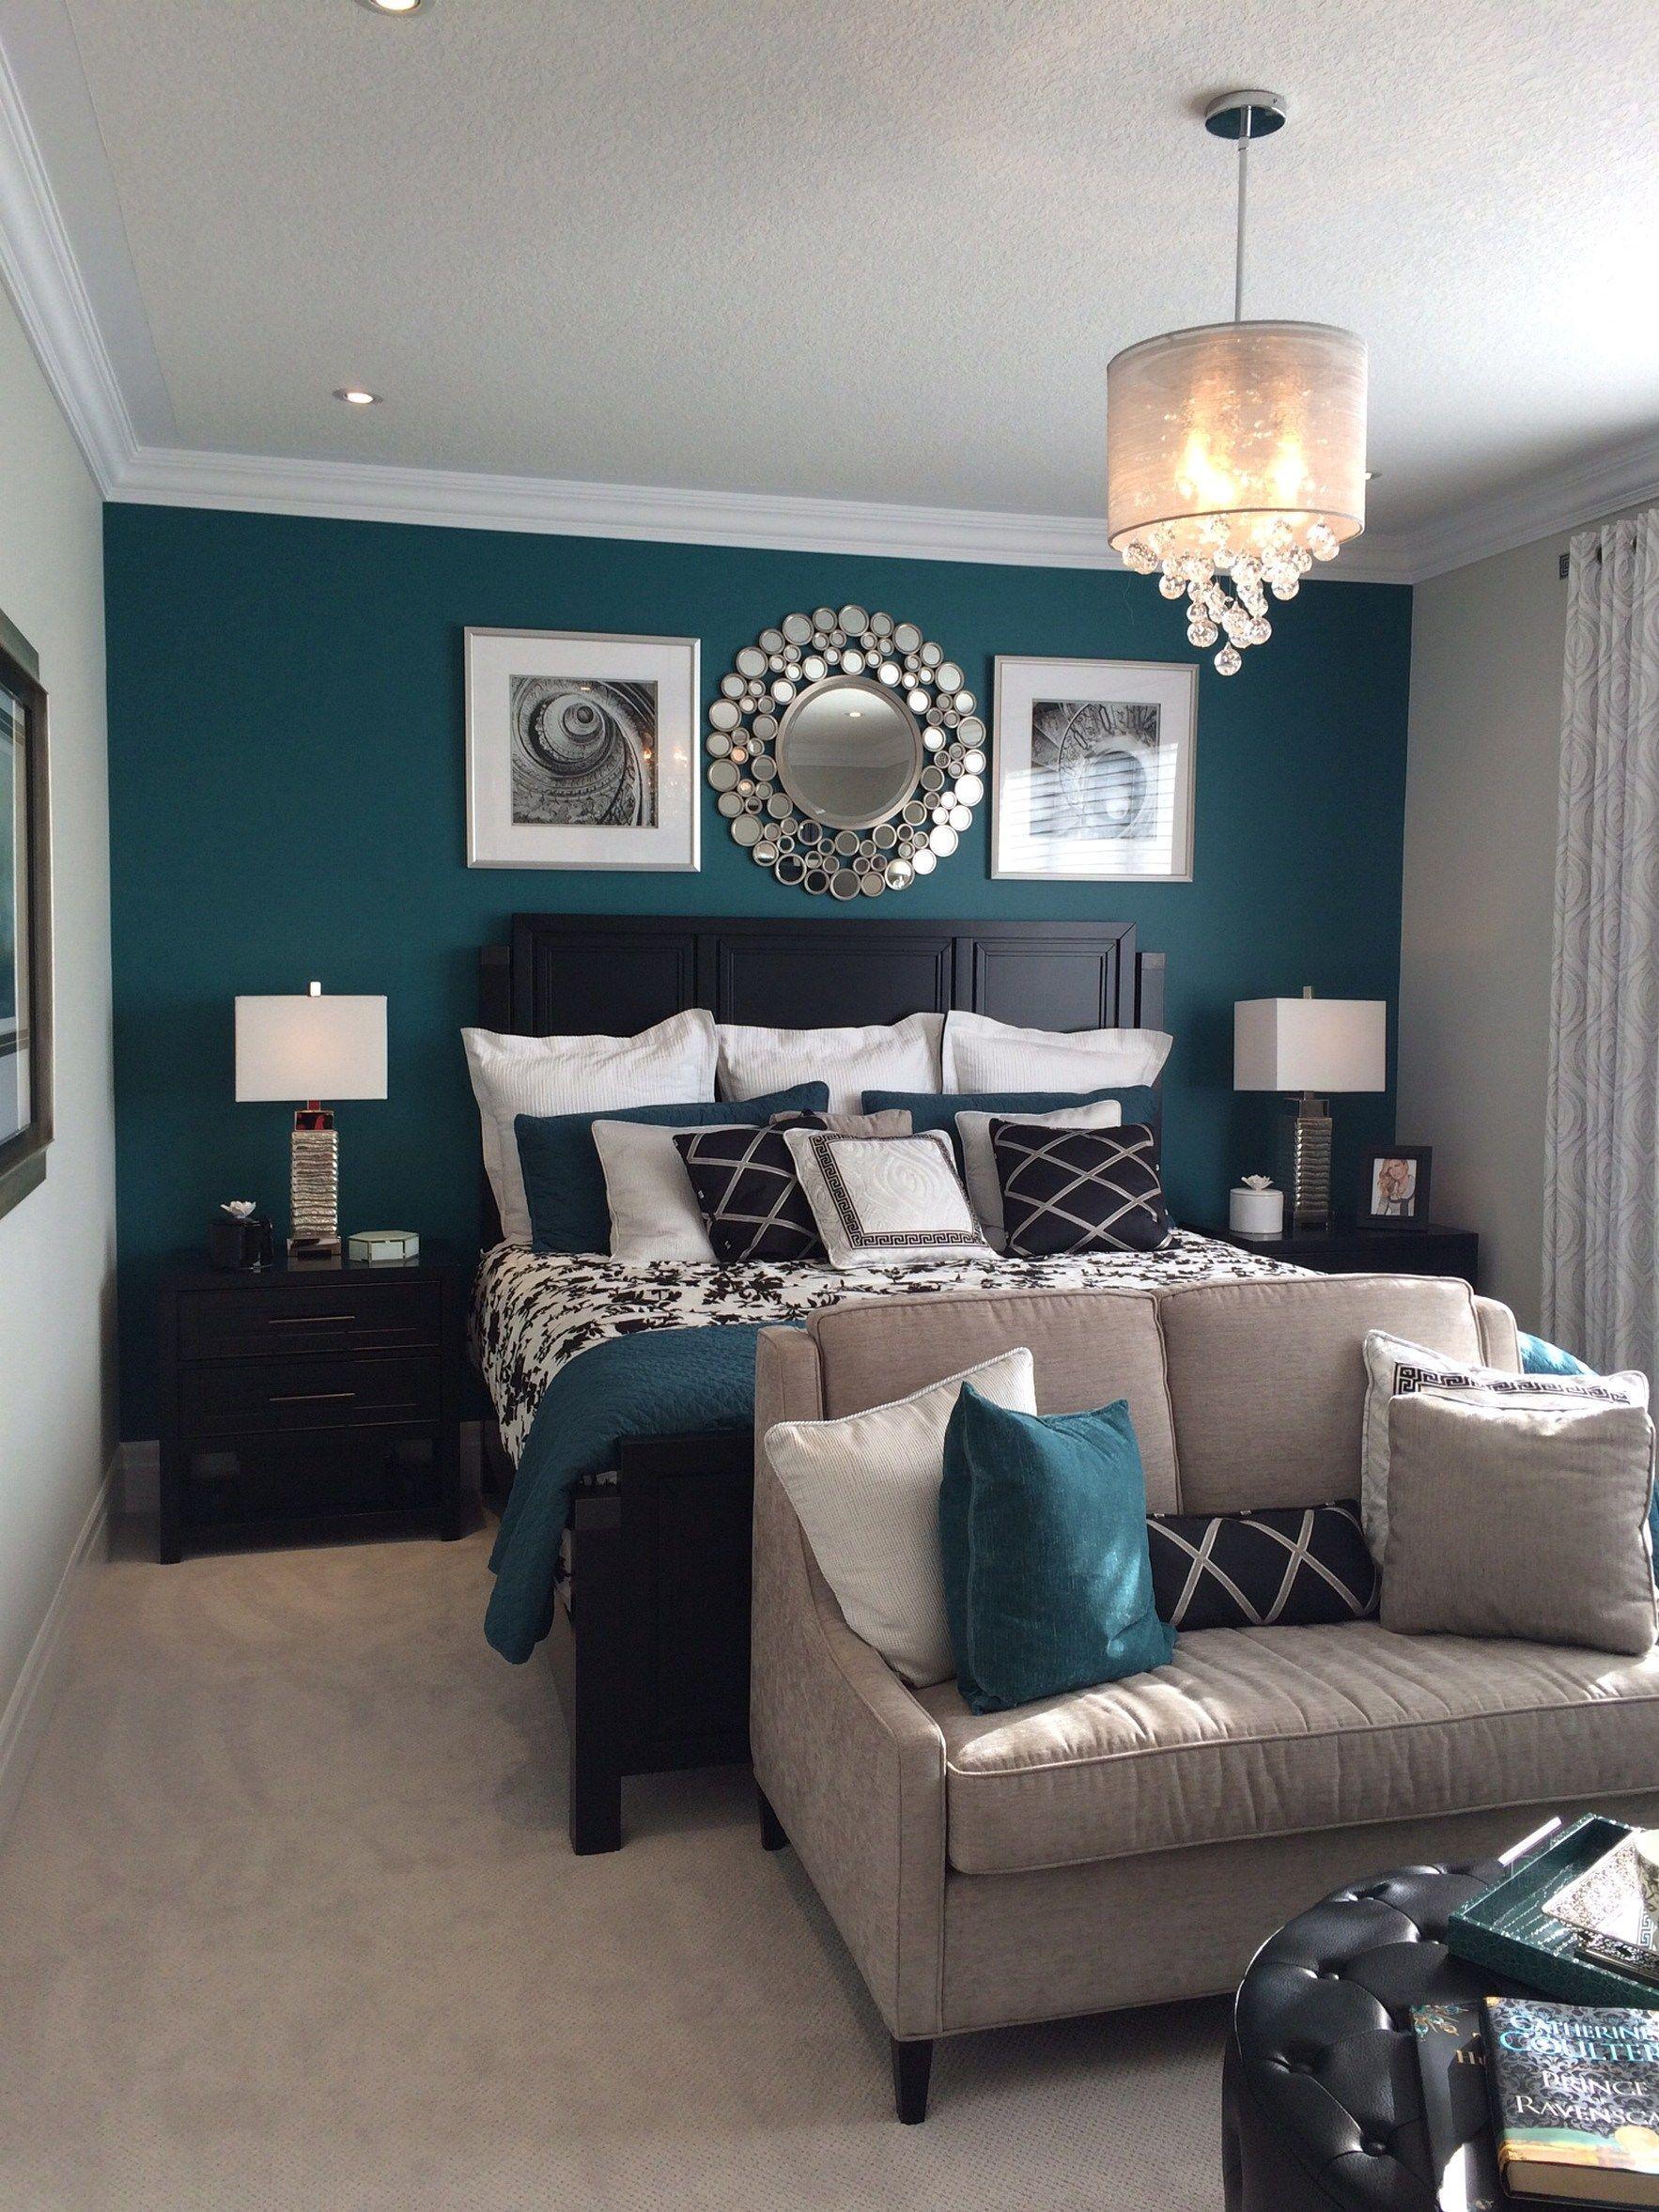 111 Gorgeous Dark Gray Bedroom Decorating Ideas 38 Master Bedrooms Decor Small Master Bedroom Remodel Bedroom